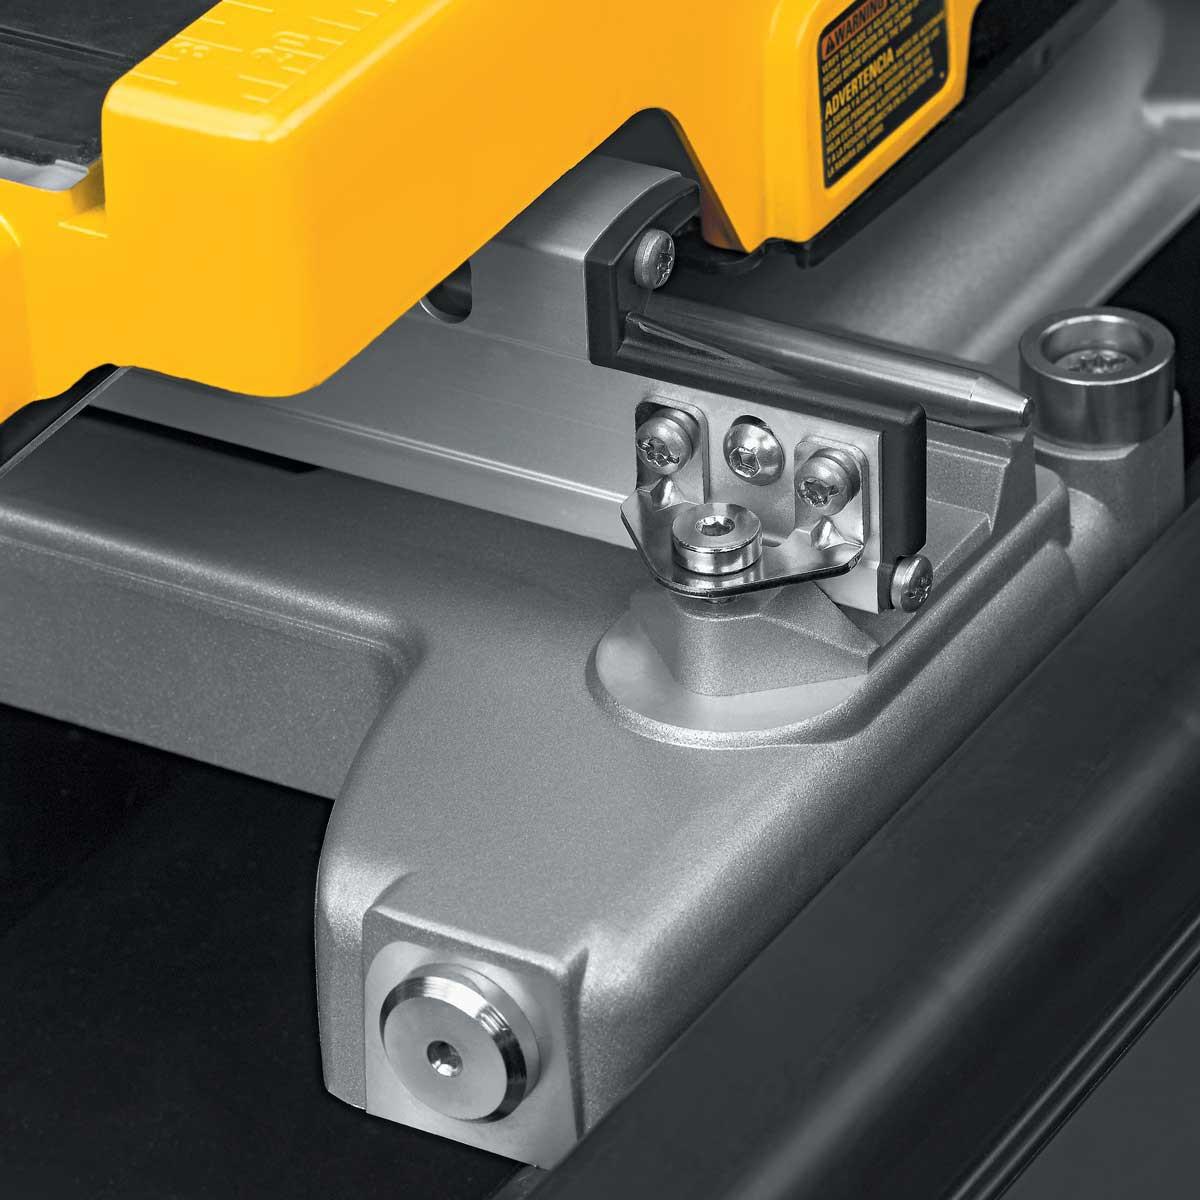 adjustment screw for dewalt wet saw